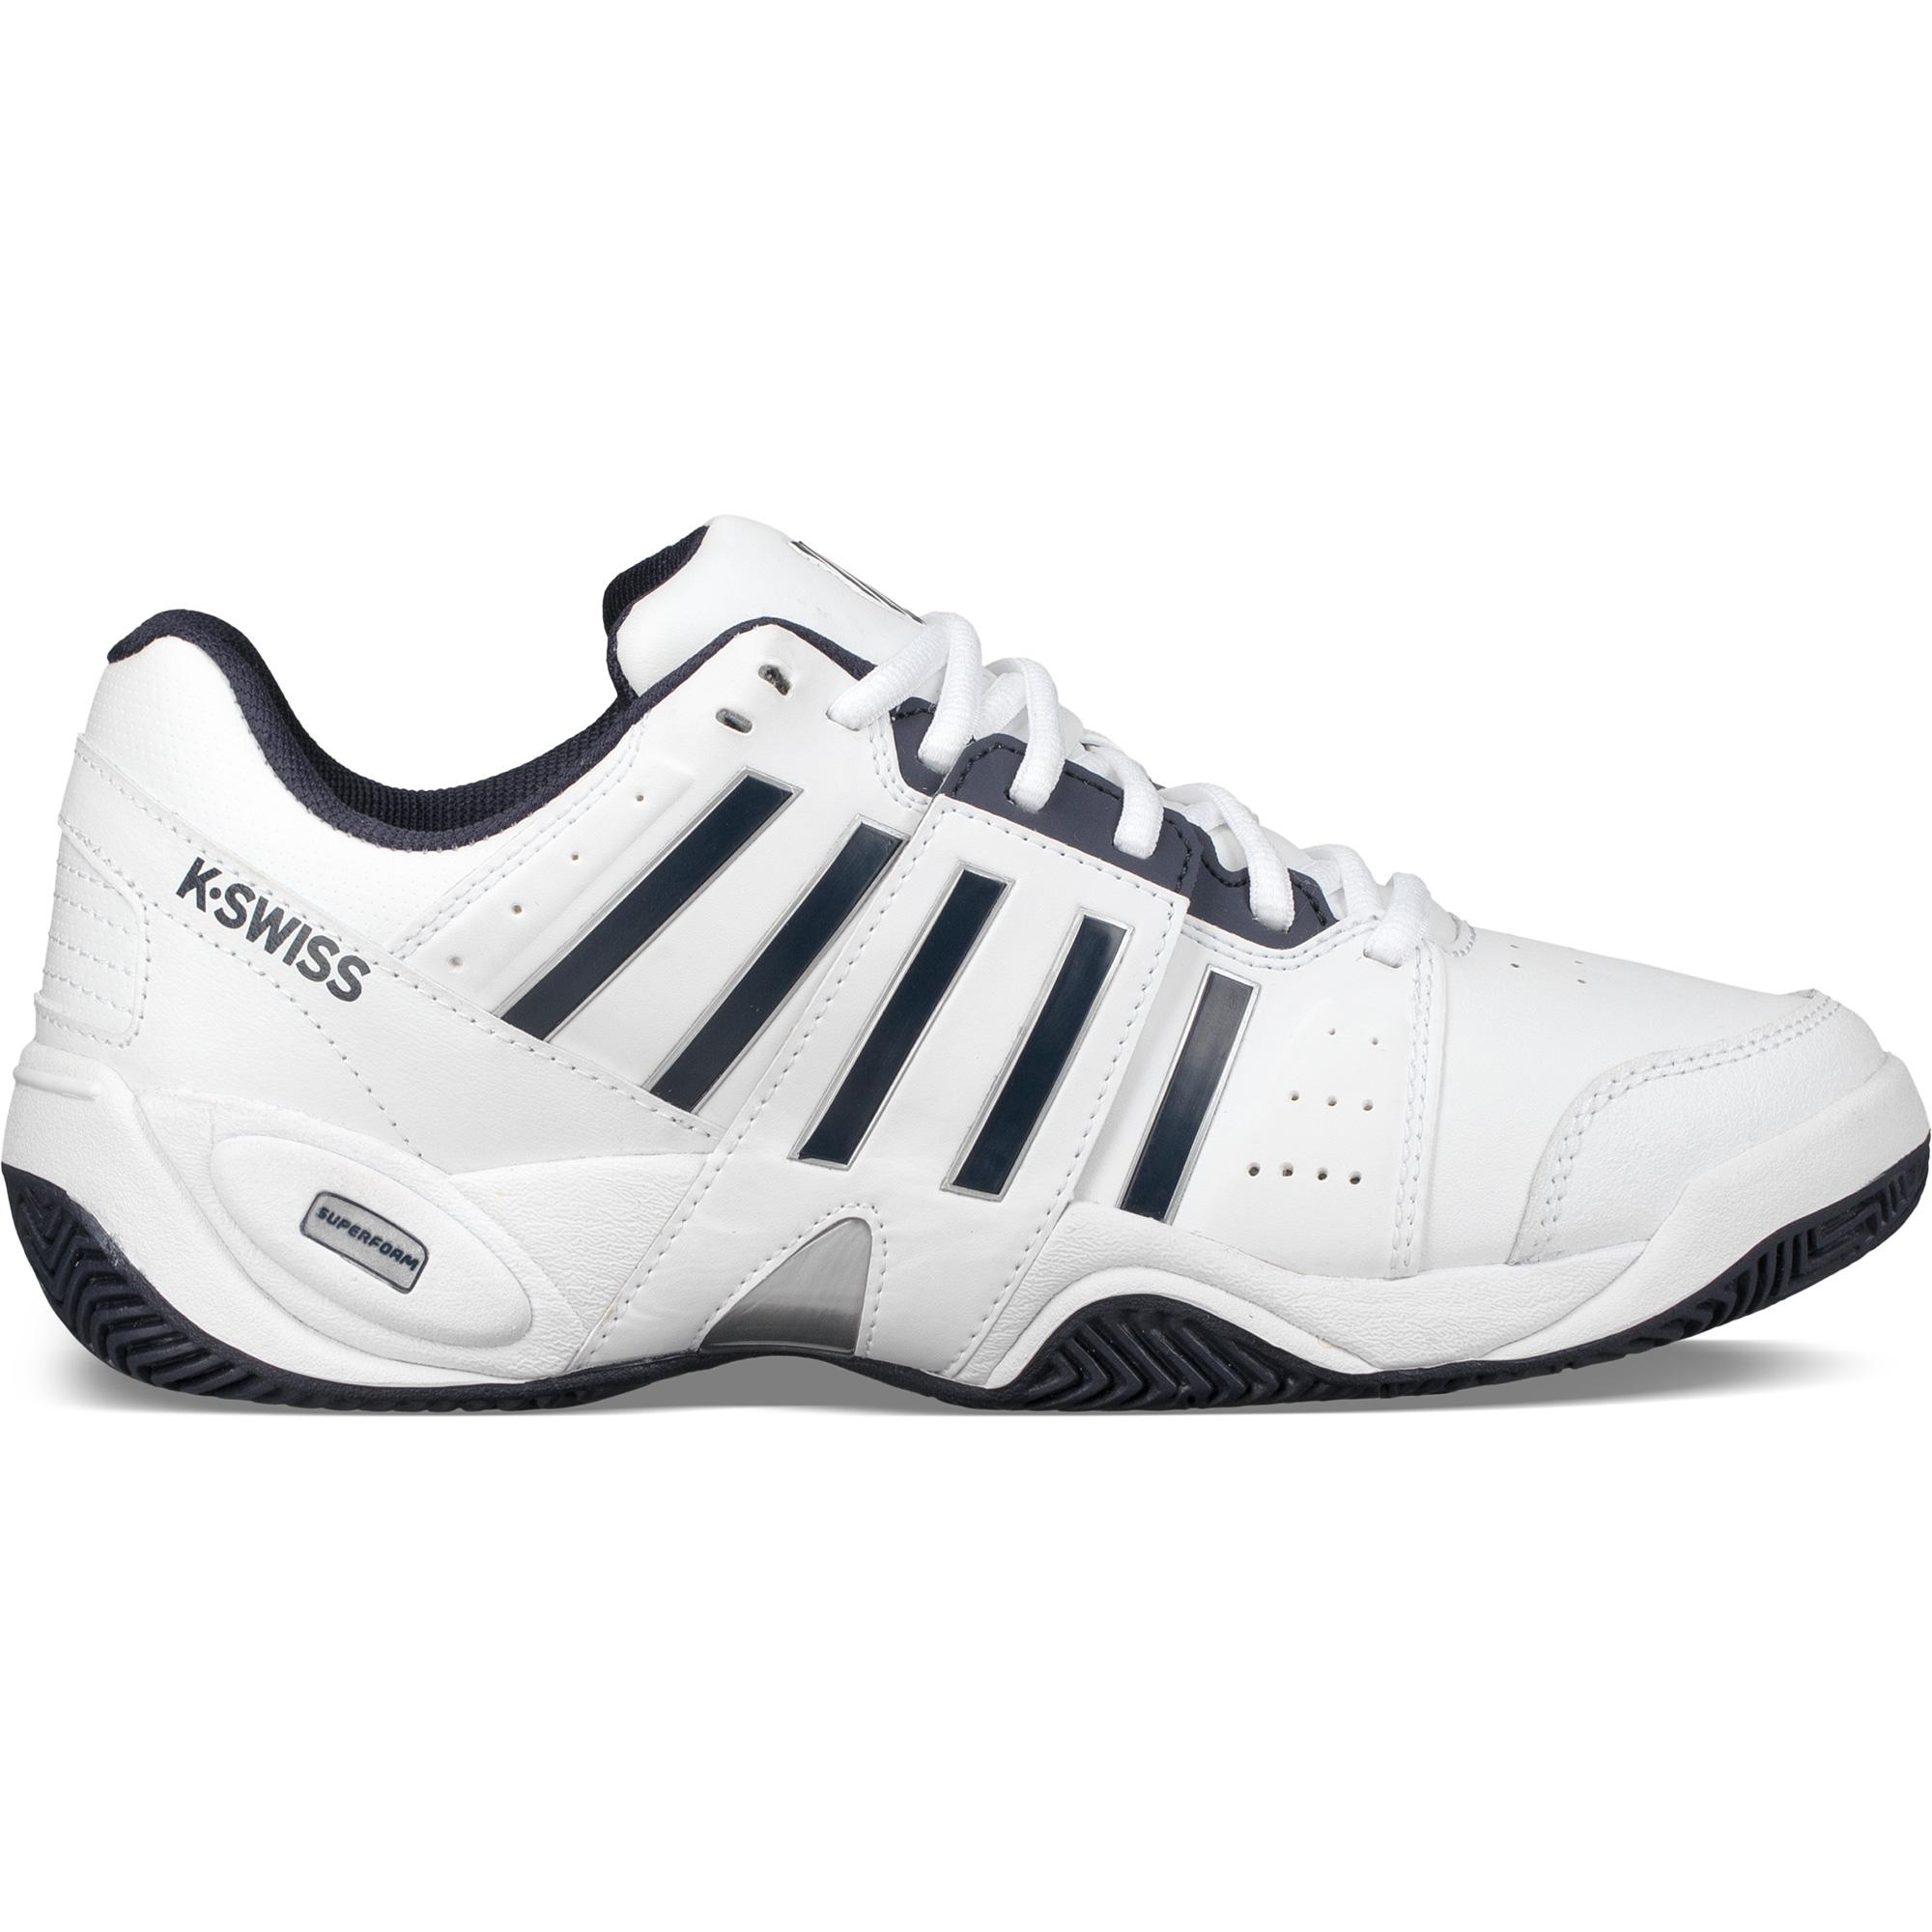 K-Swiss Mens Accomplish III Tennis Shoes - White Navy - Tennisnuts.com b2952d43db54